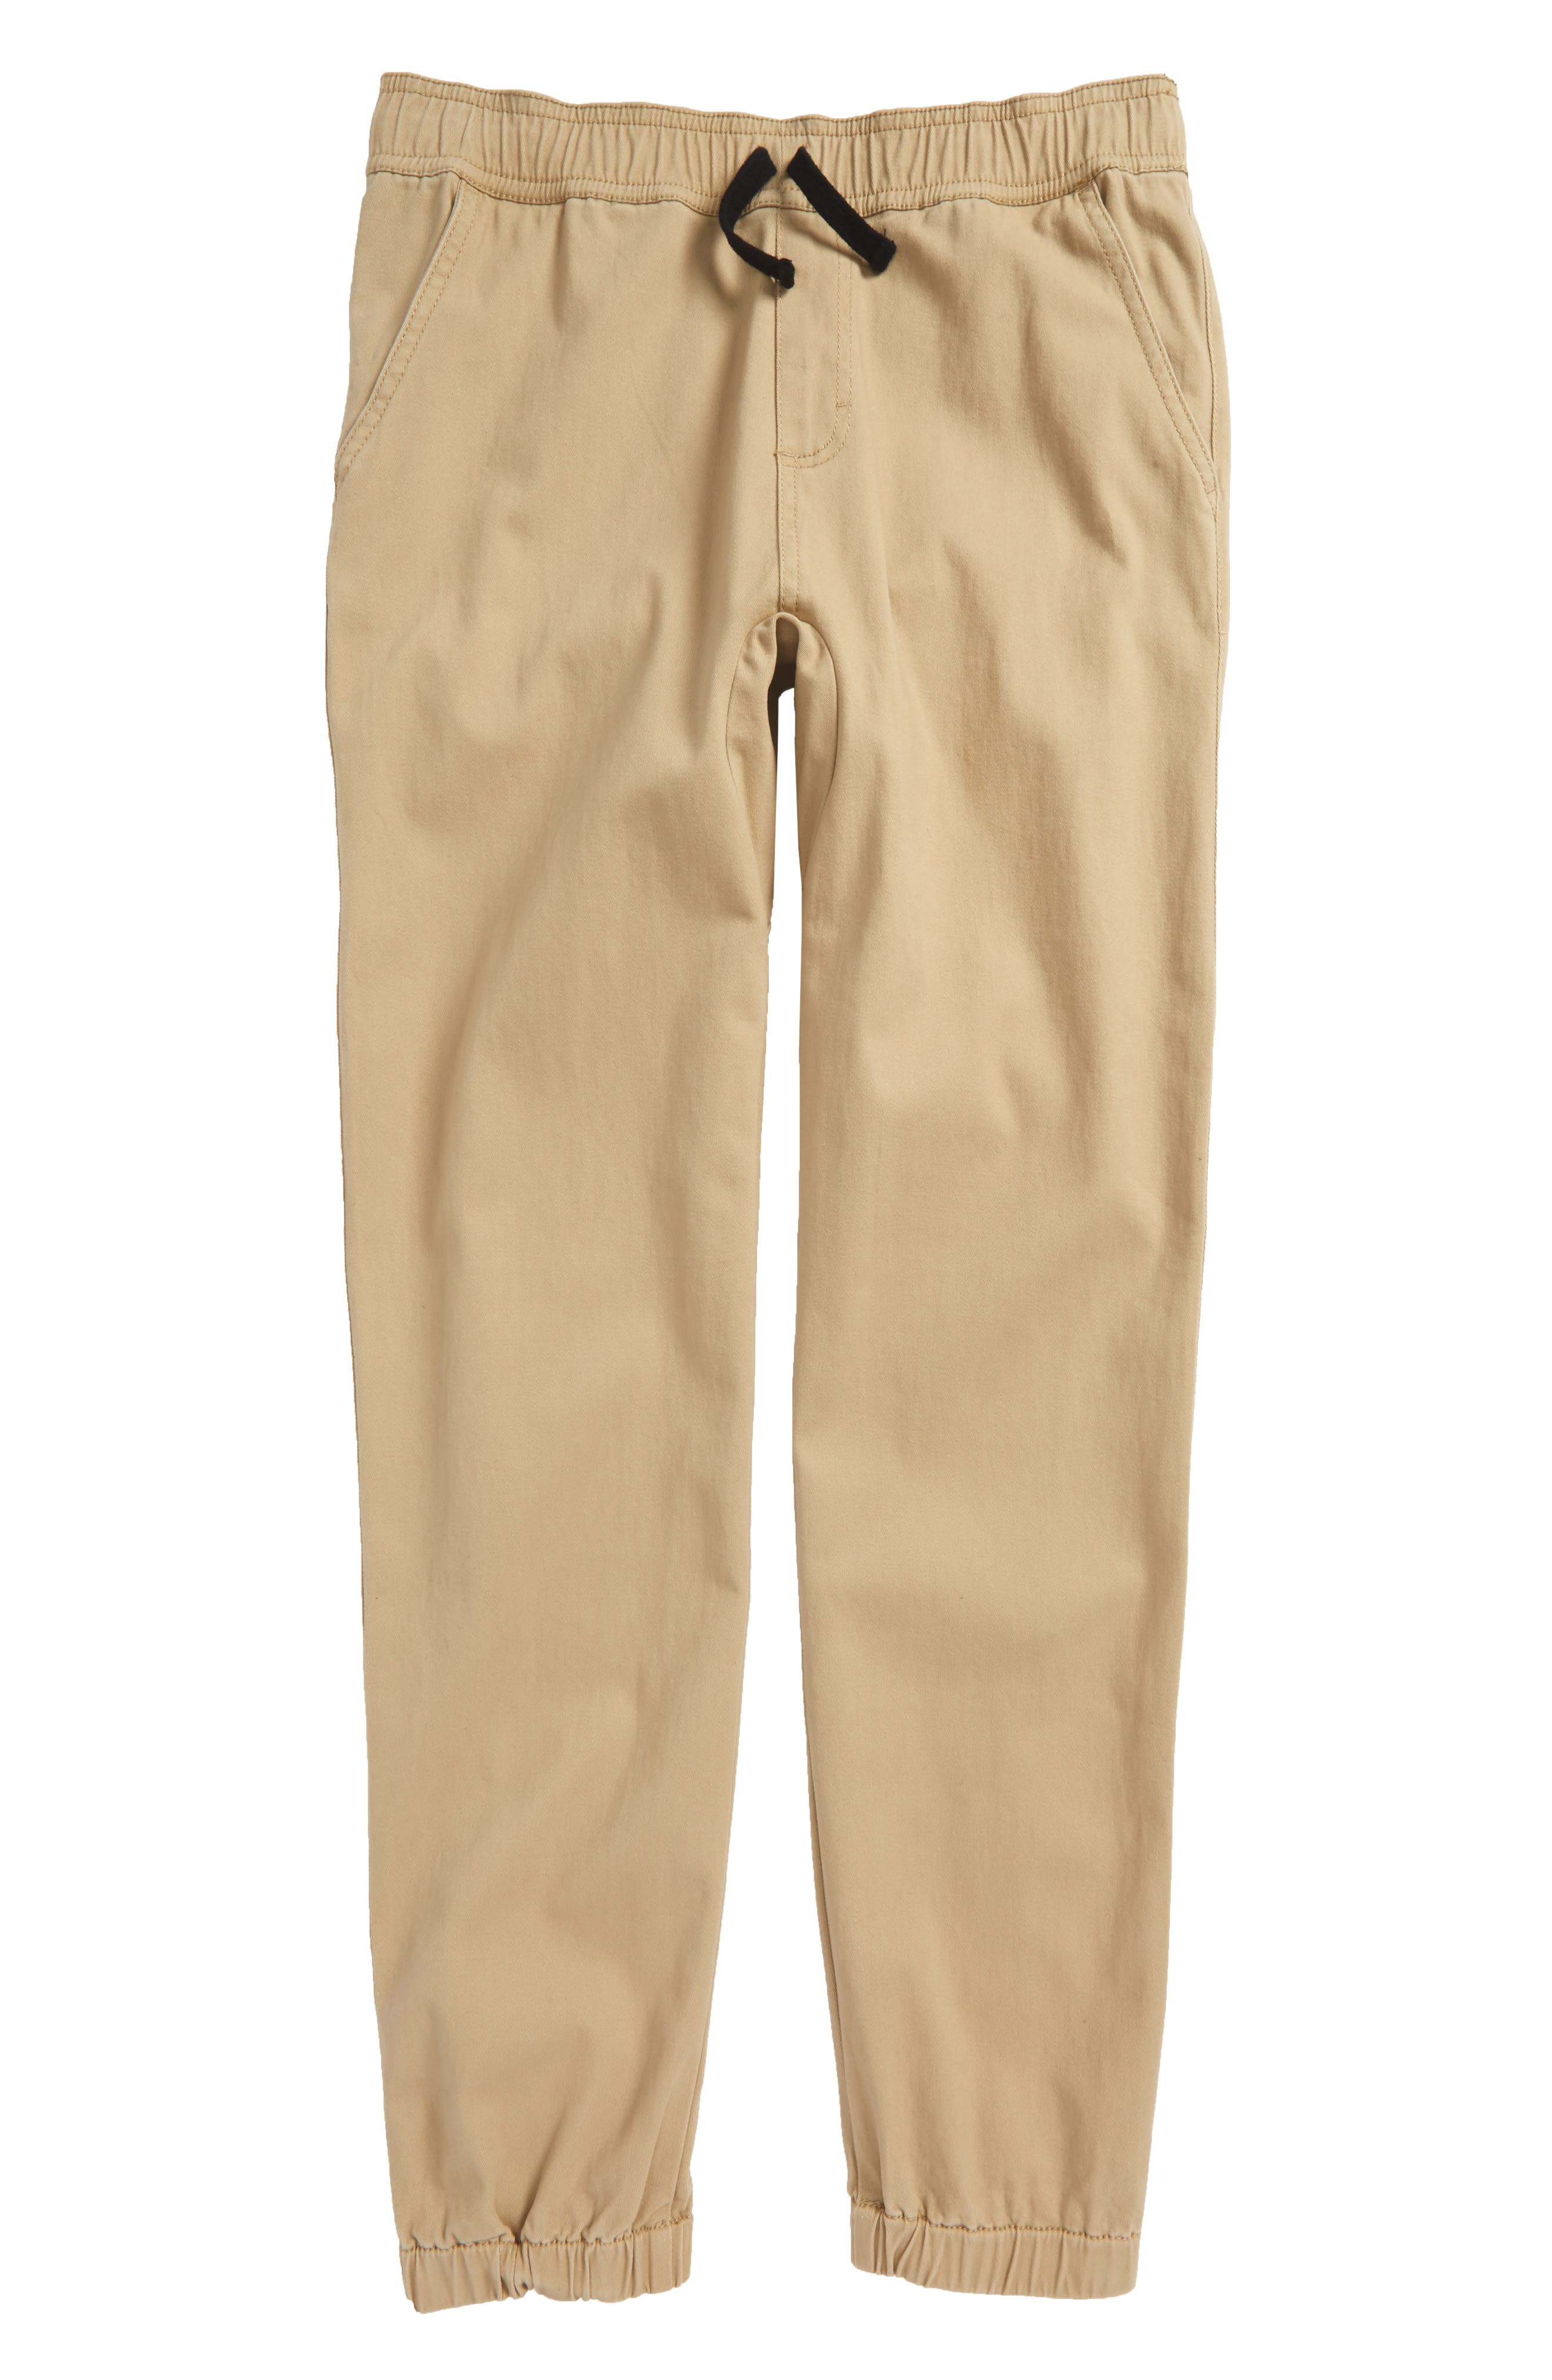 Tucker + Tate Woven Jogger Pants (Toddler Boys, Little Boys & Big Boys)